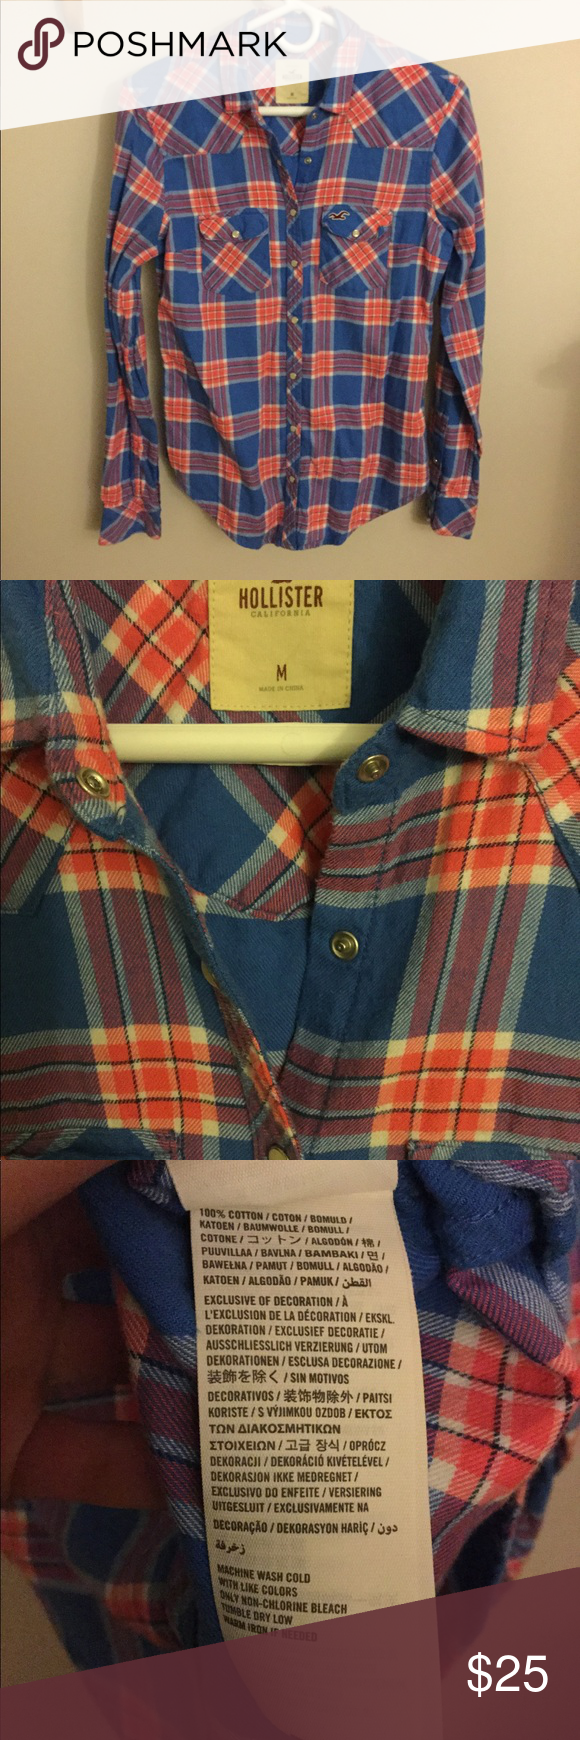 Red flannel unbuttoned  Hollister Flannel Shirt  My Posh Picks  Pinterest  Flannel shirts